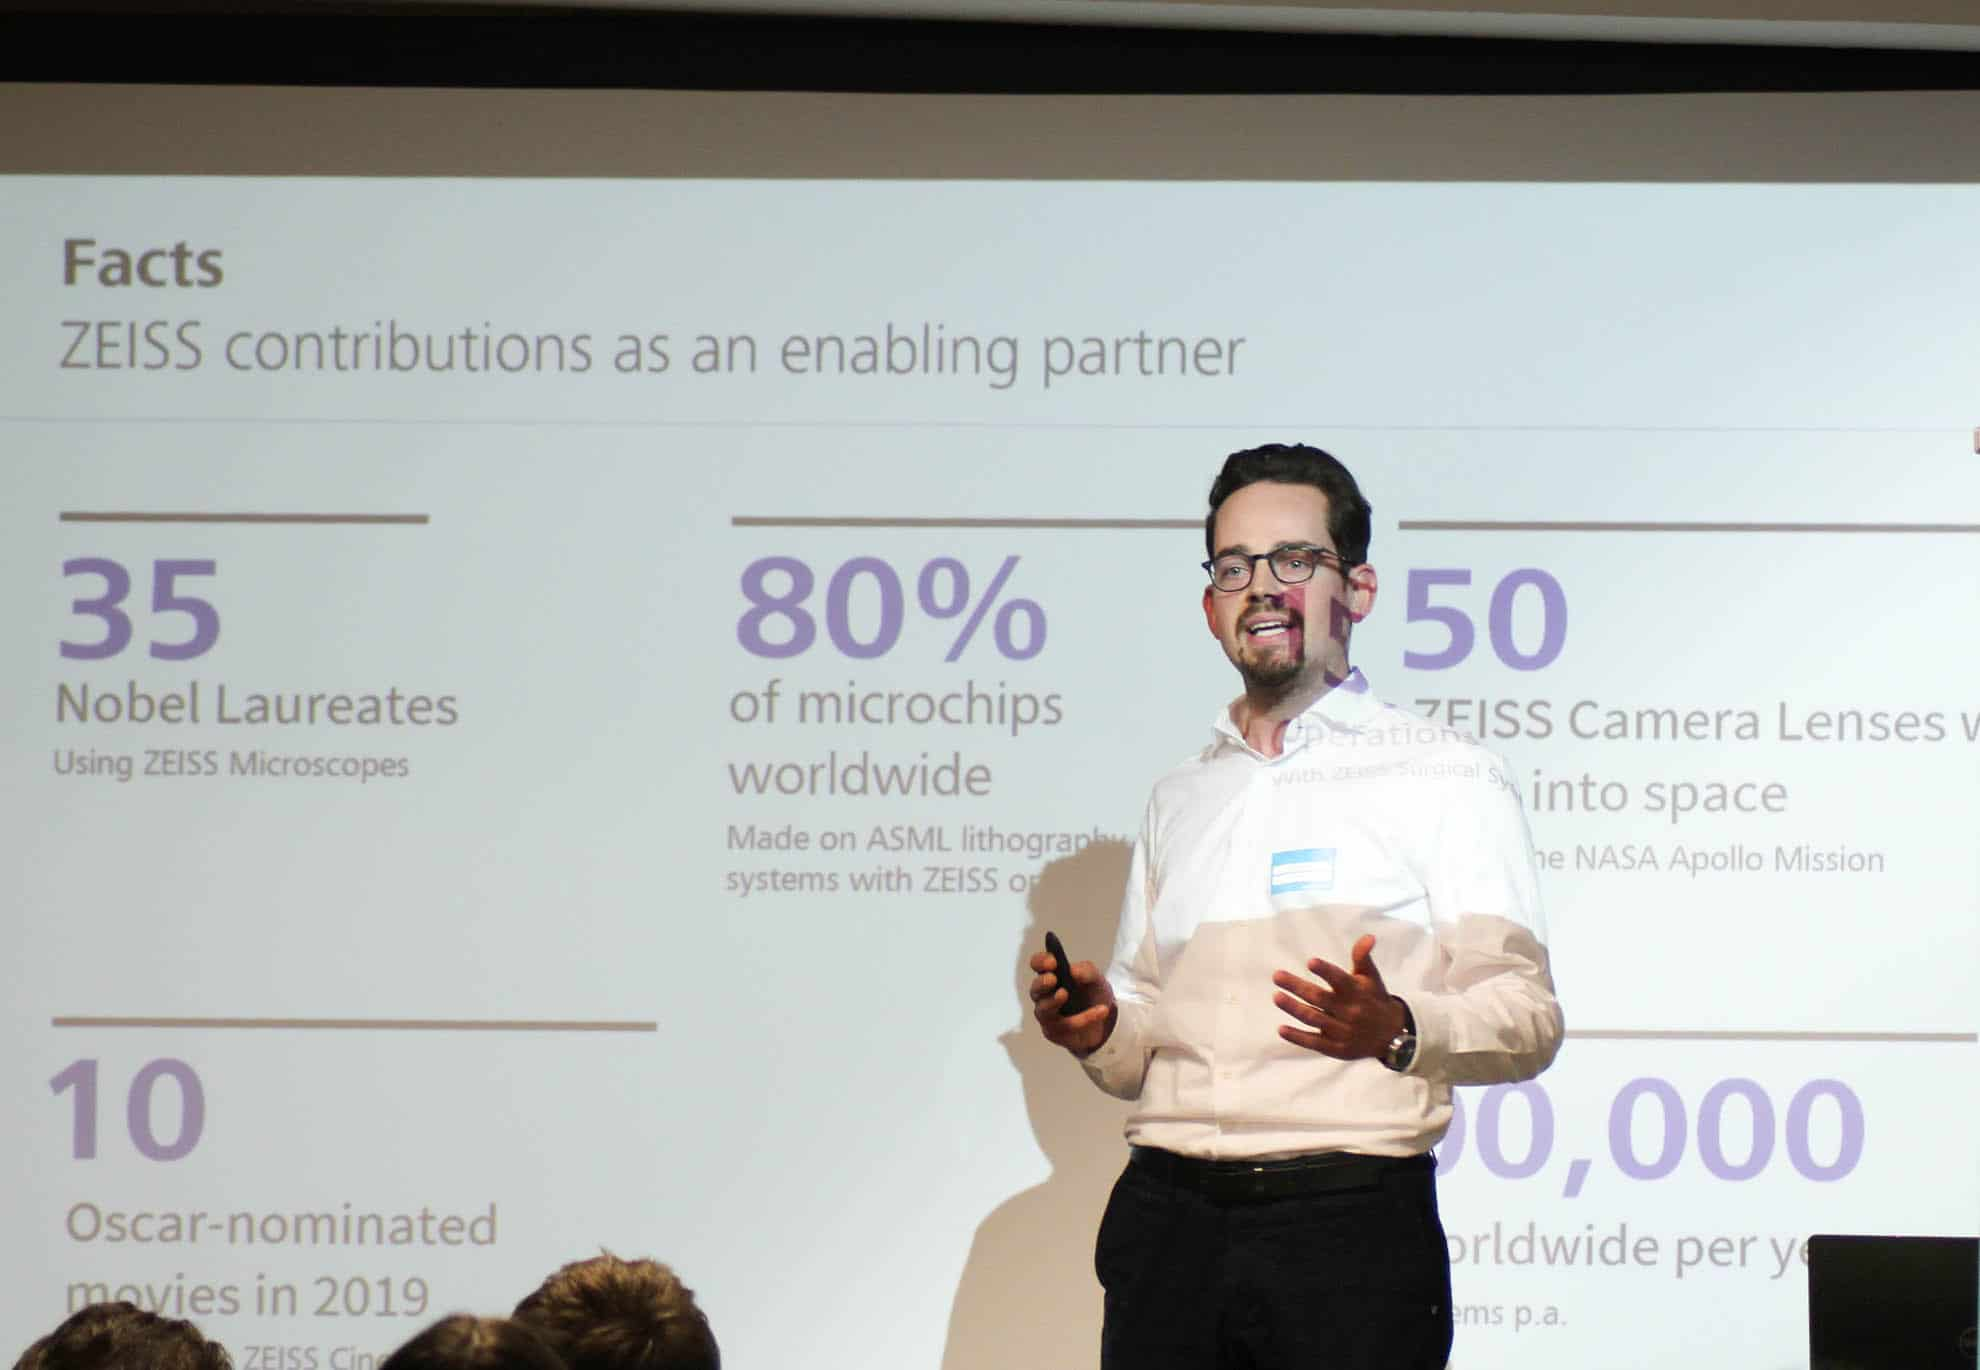 Interview mit Brand Experience Partner Felix Neugebauer (ZEISS)